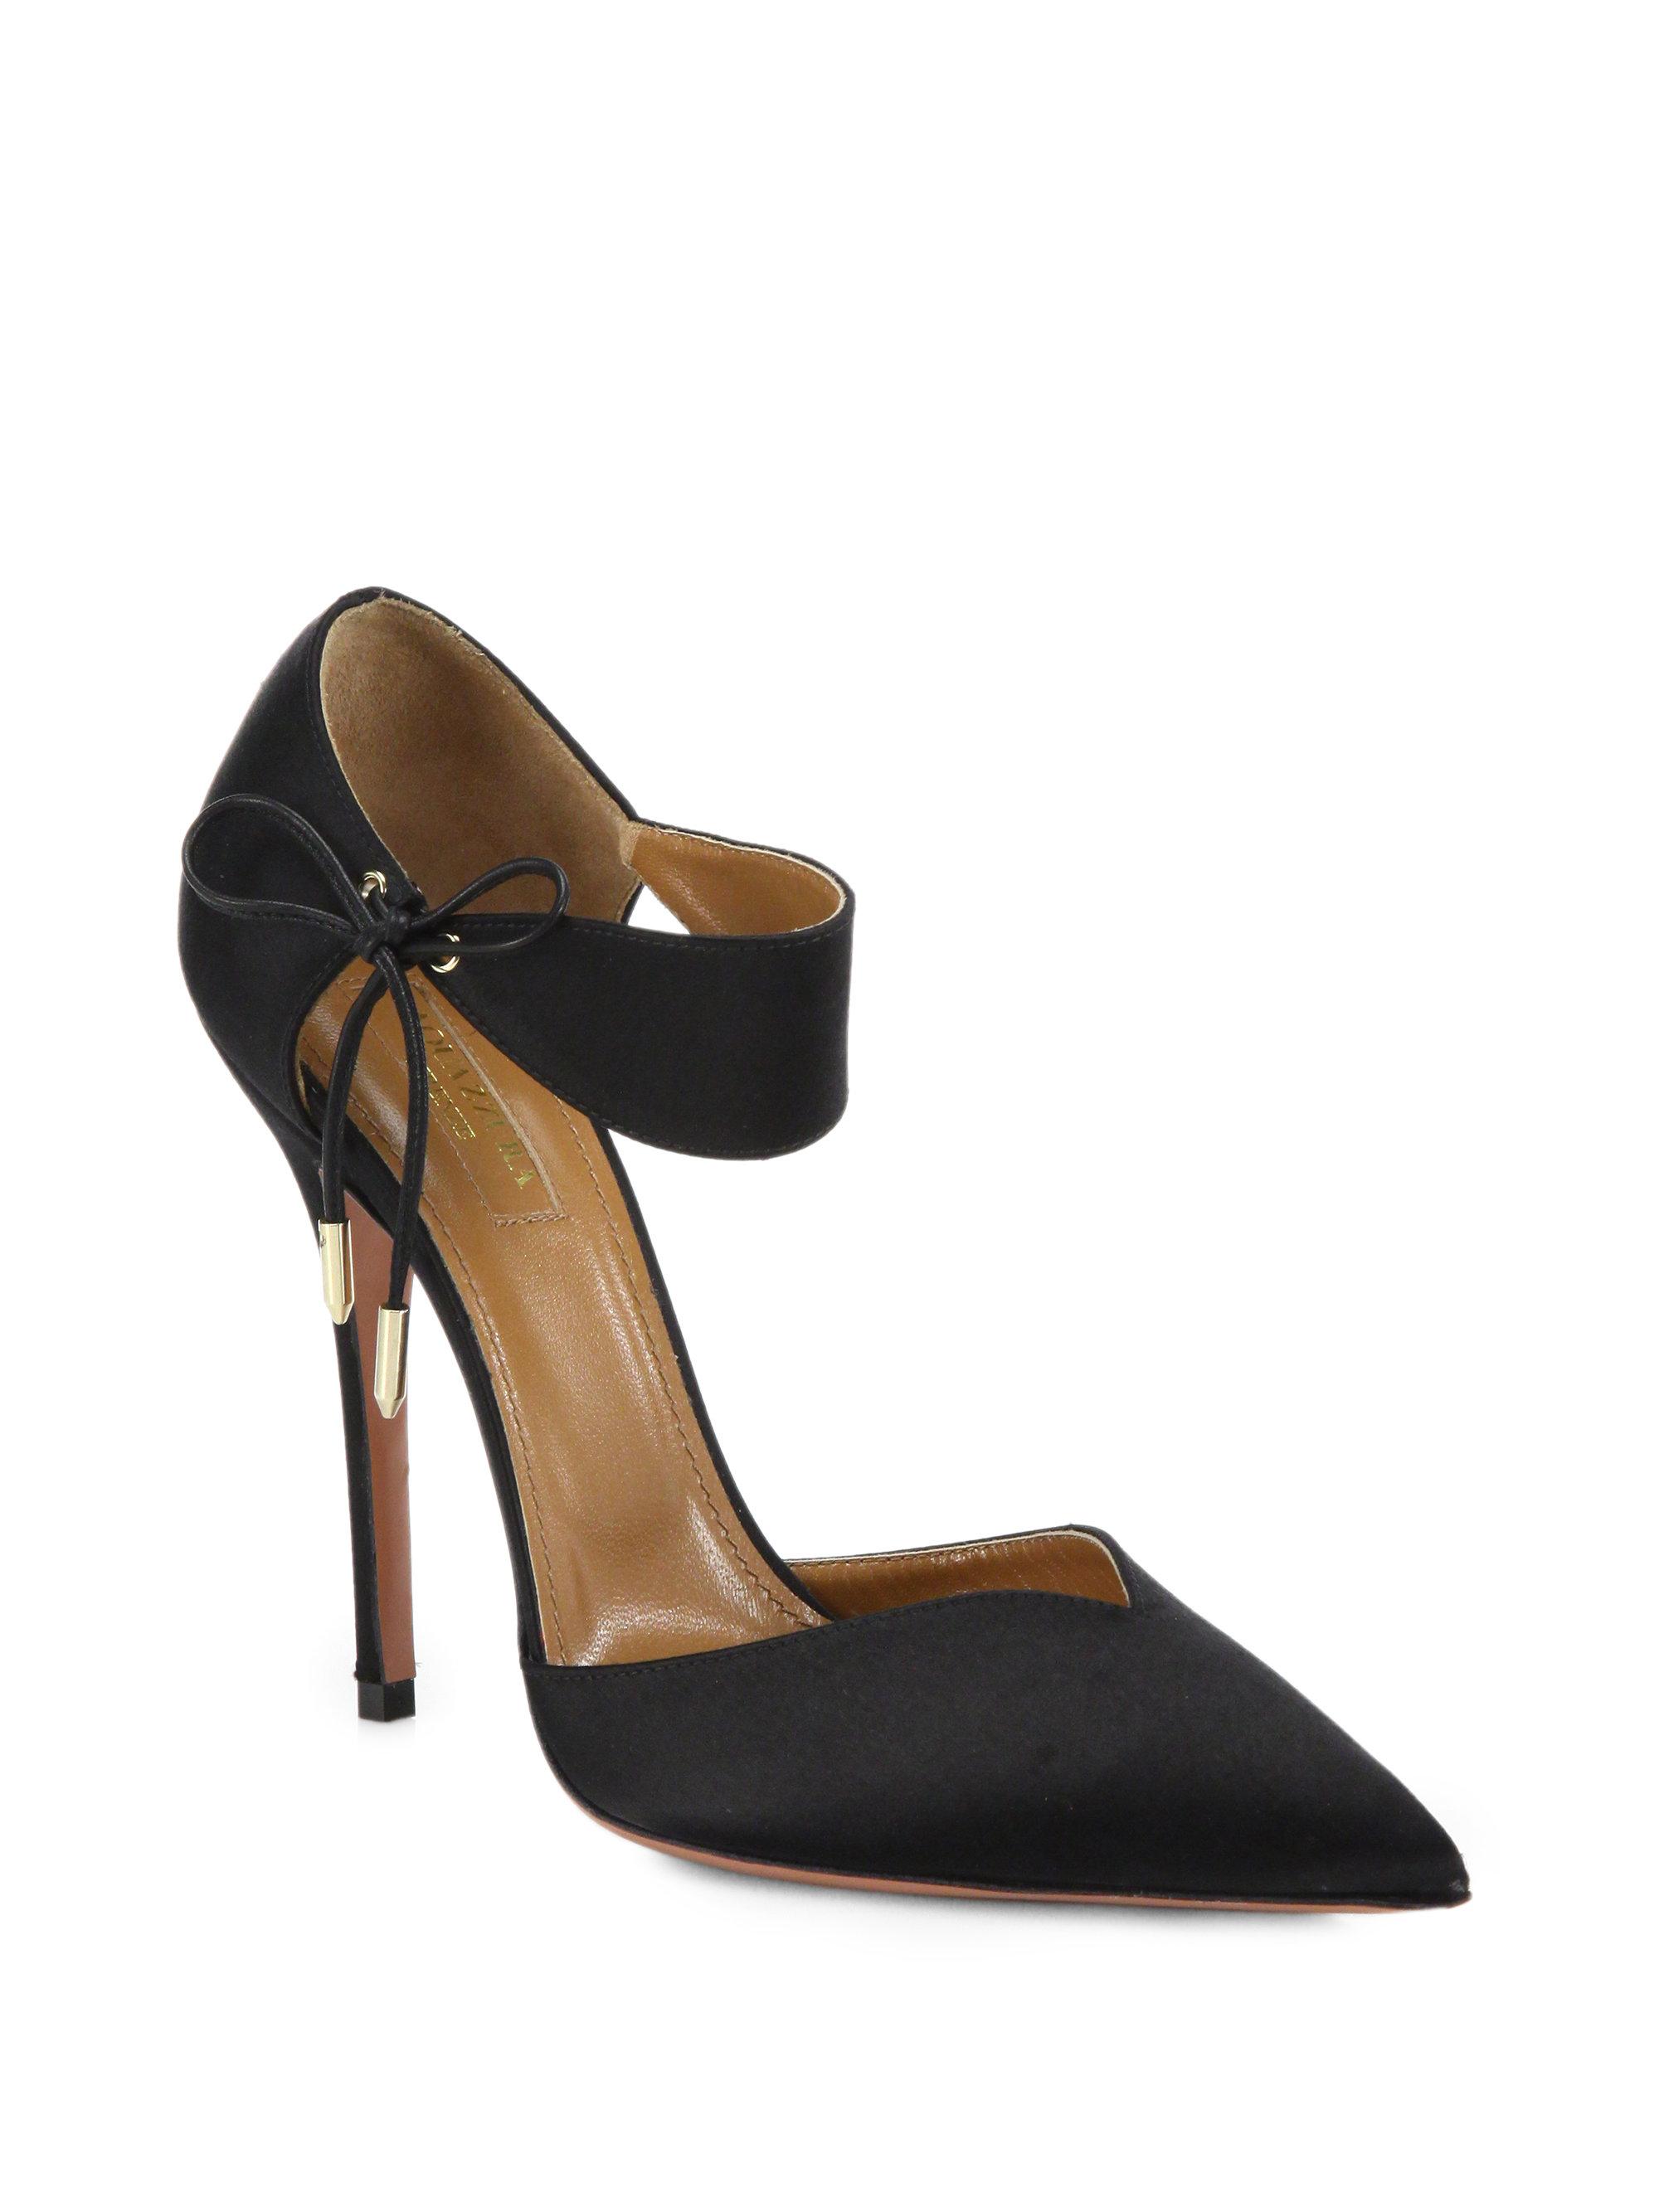 c264d63a2db Lyst - Aquazzura Candela Ankle-tie Satin Pumps in Black